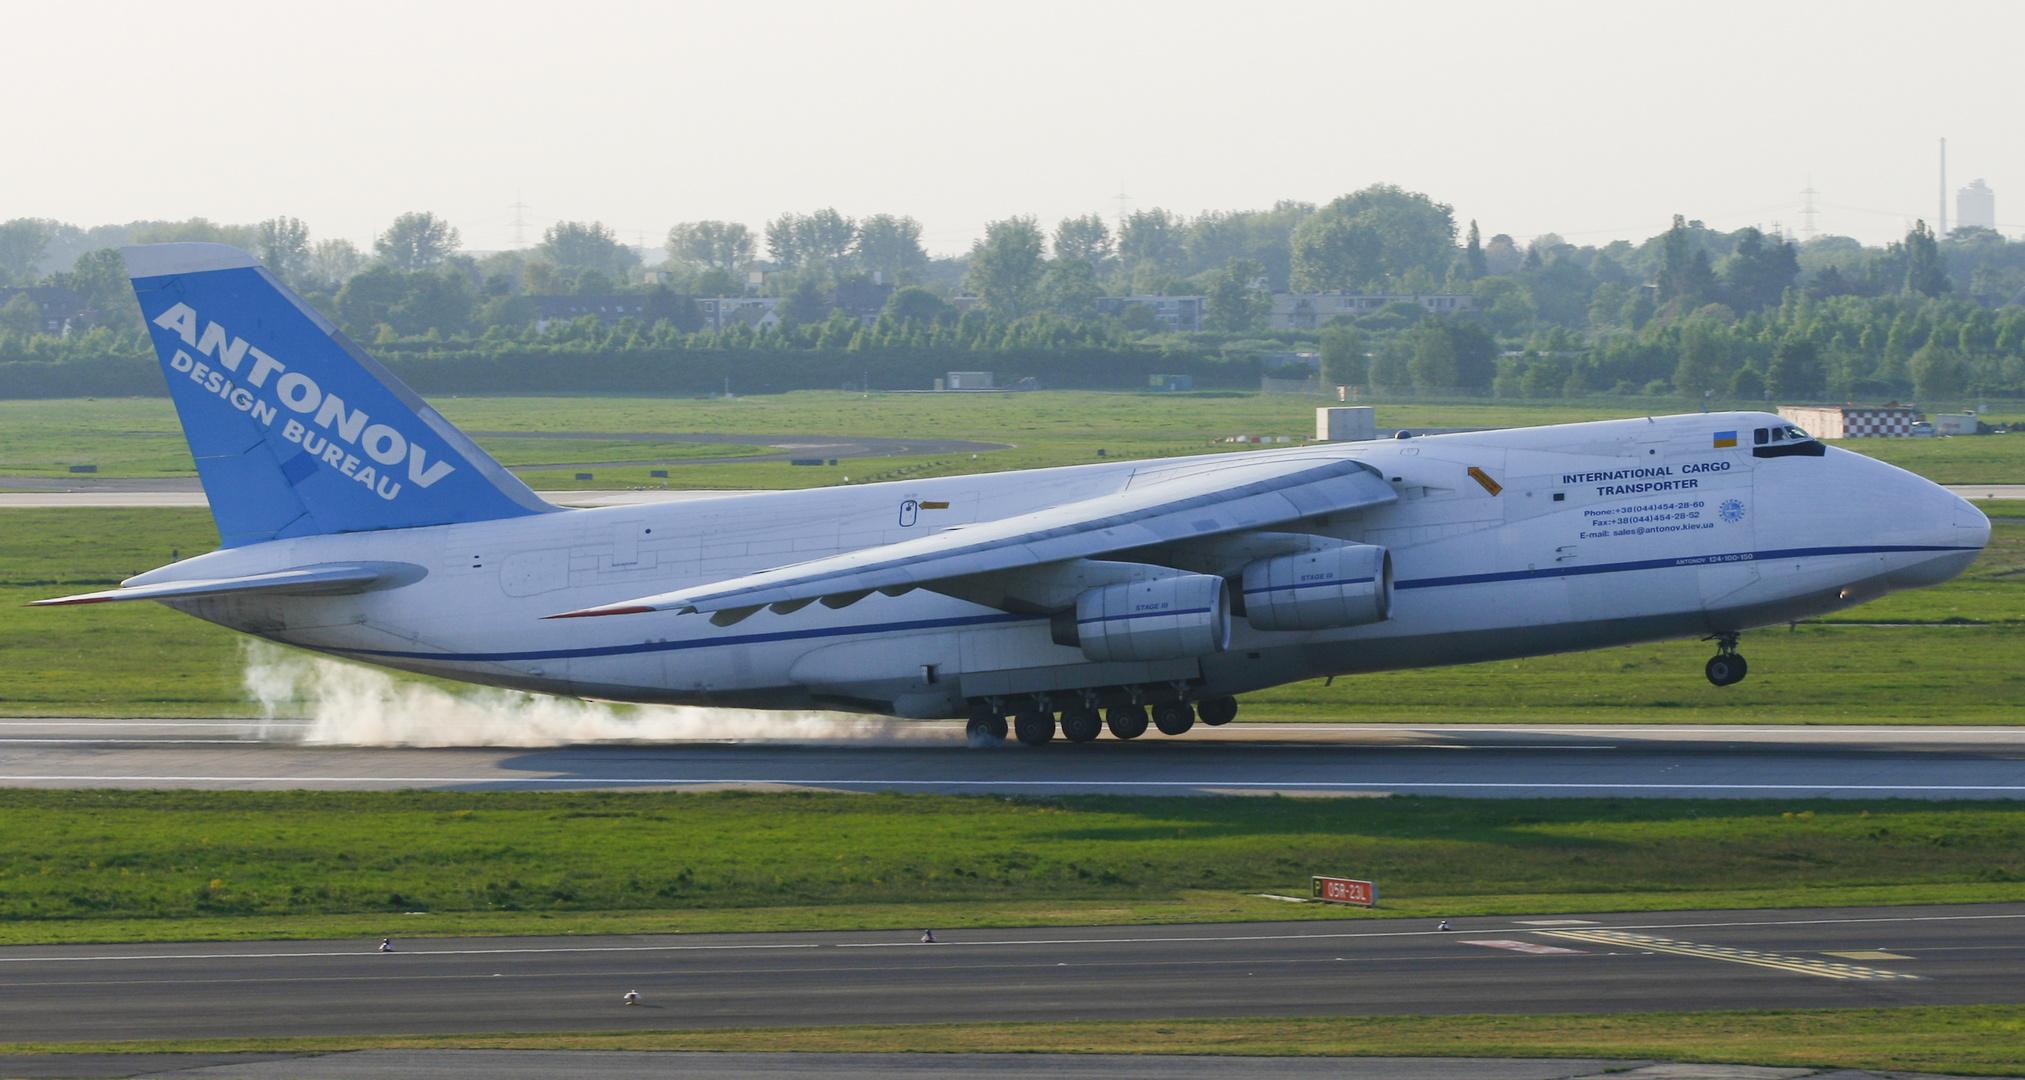 Die Antonov Design Bureau Antonov AN-124-100 in Düsseldorf